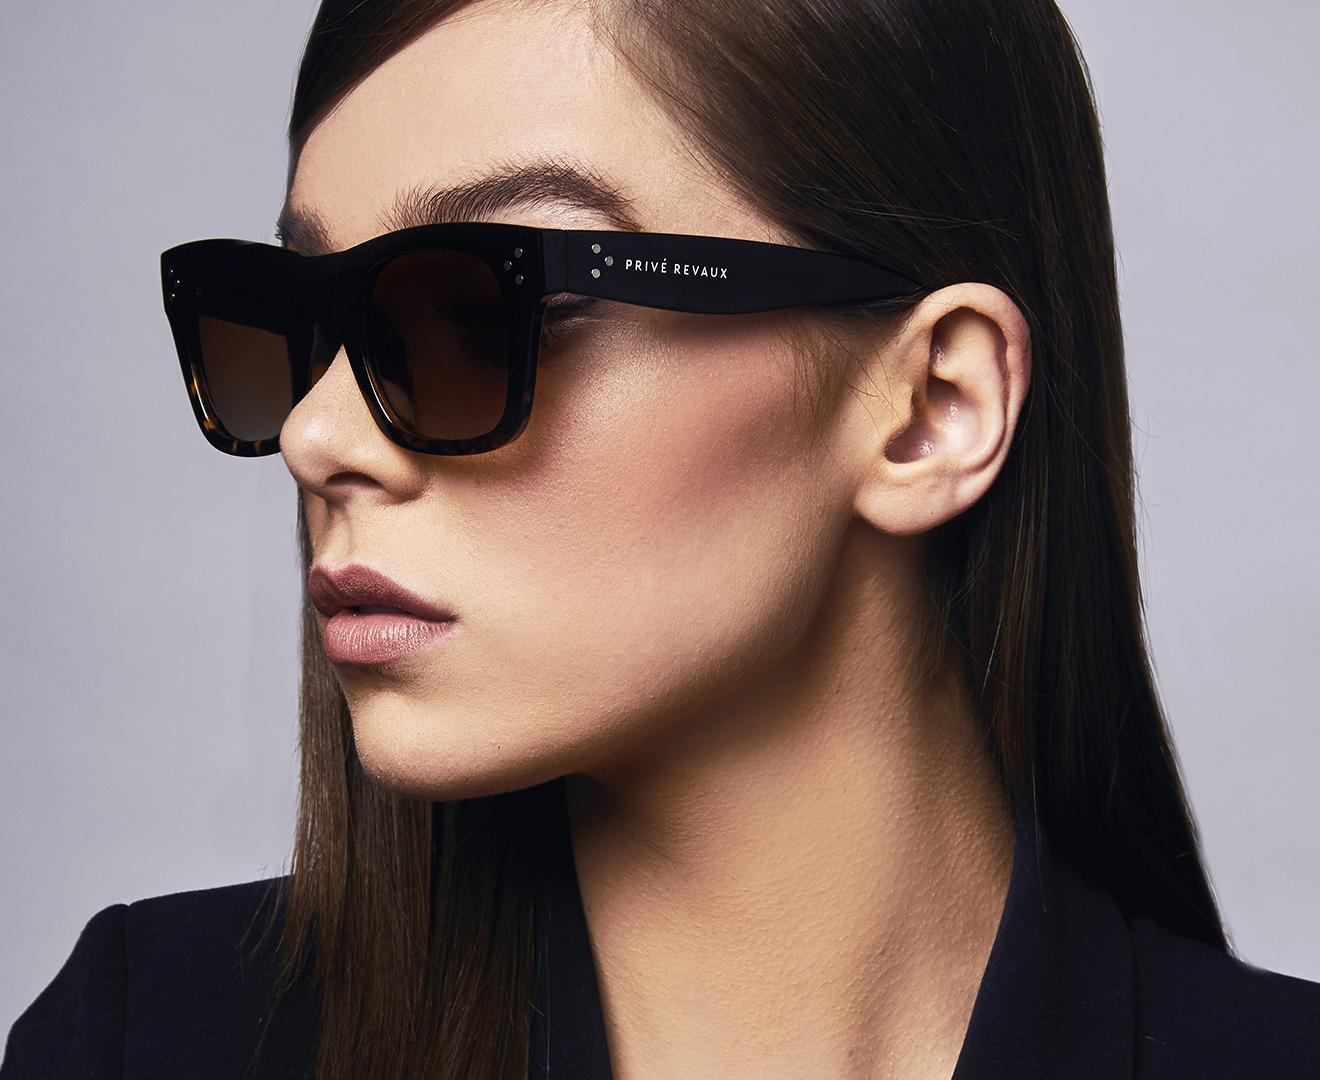 0f13523b59a09 Privé Revaux Women s The Classic Polarised Sunglasses - Black ...